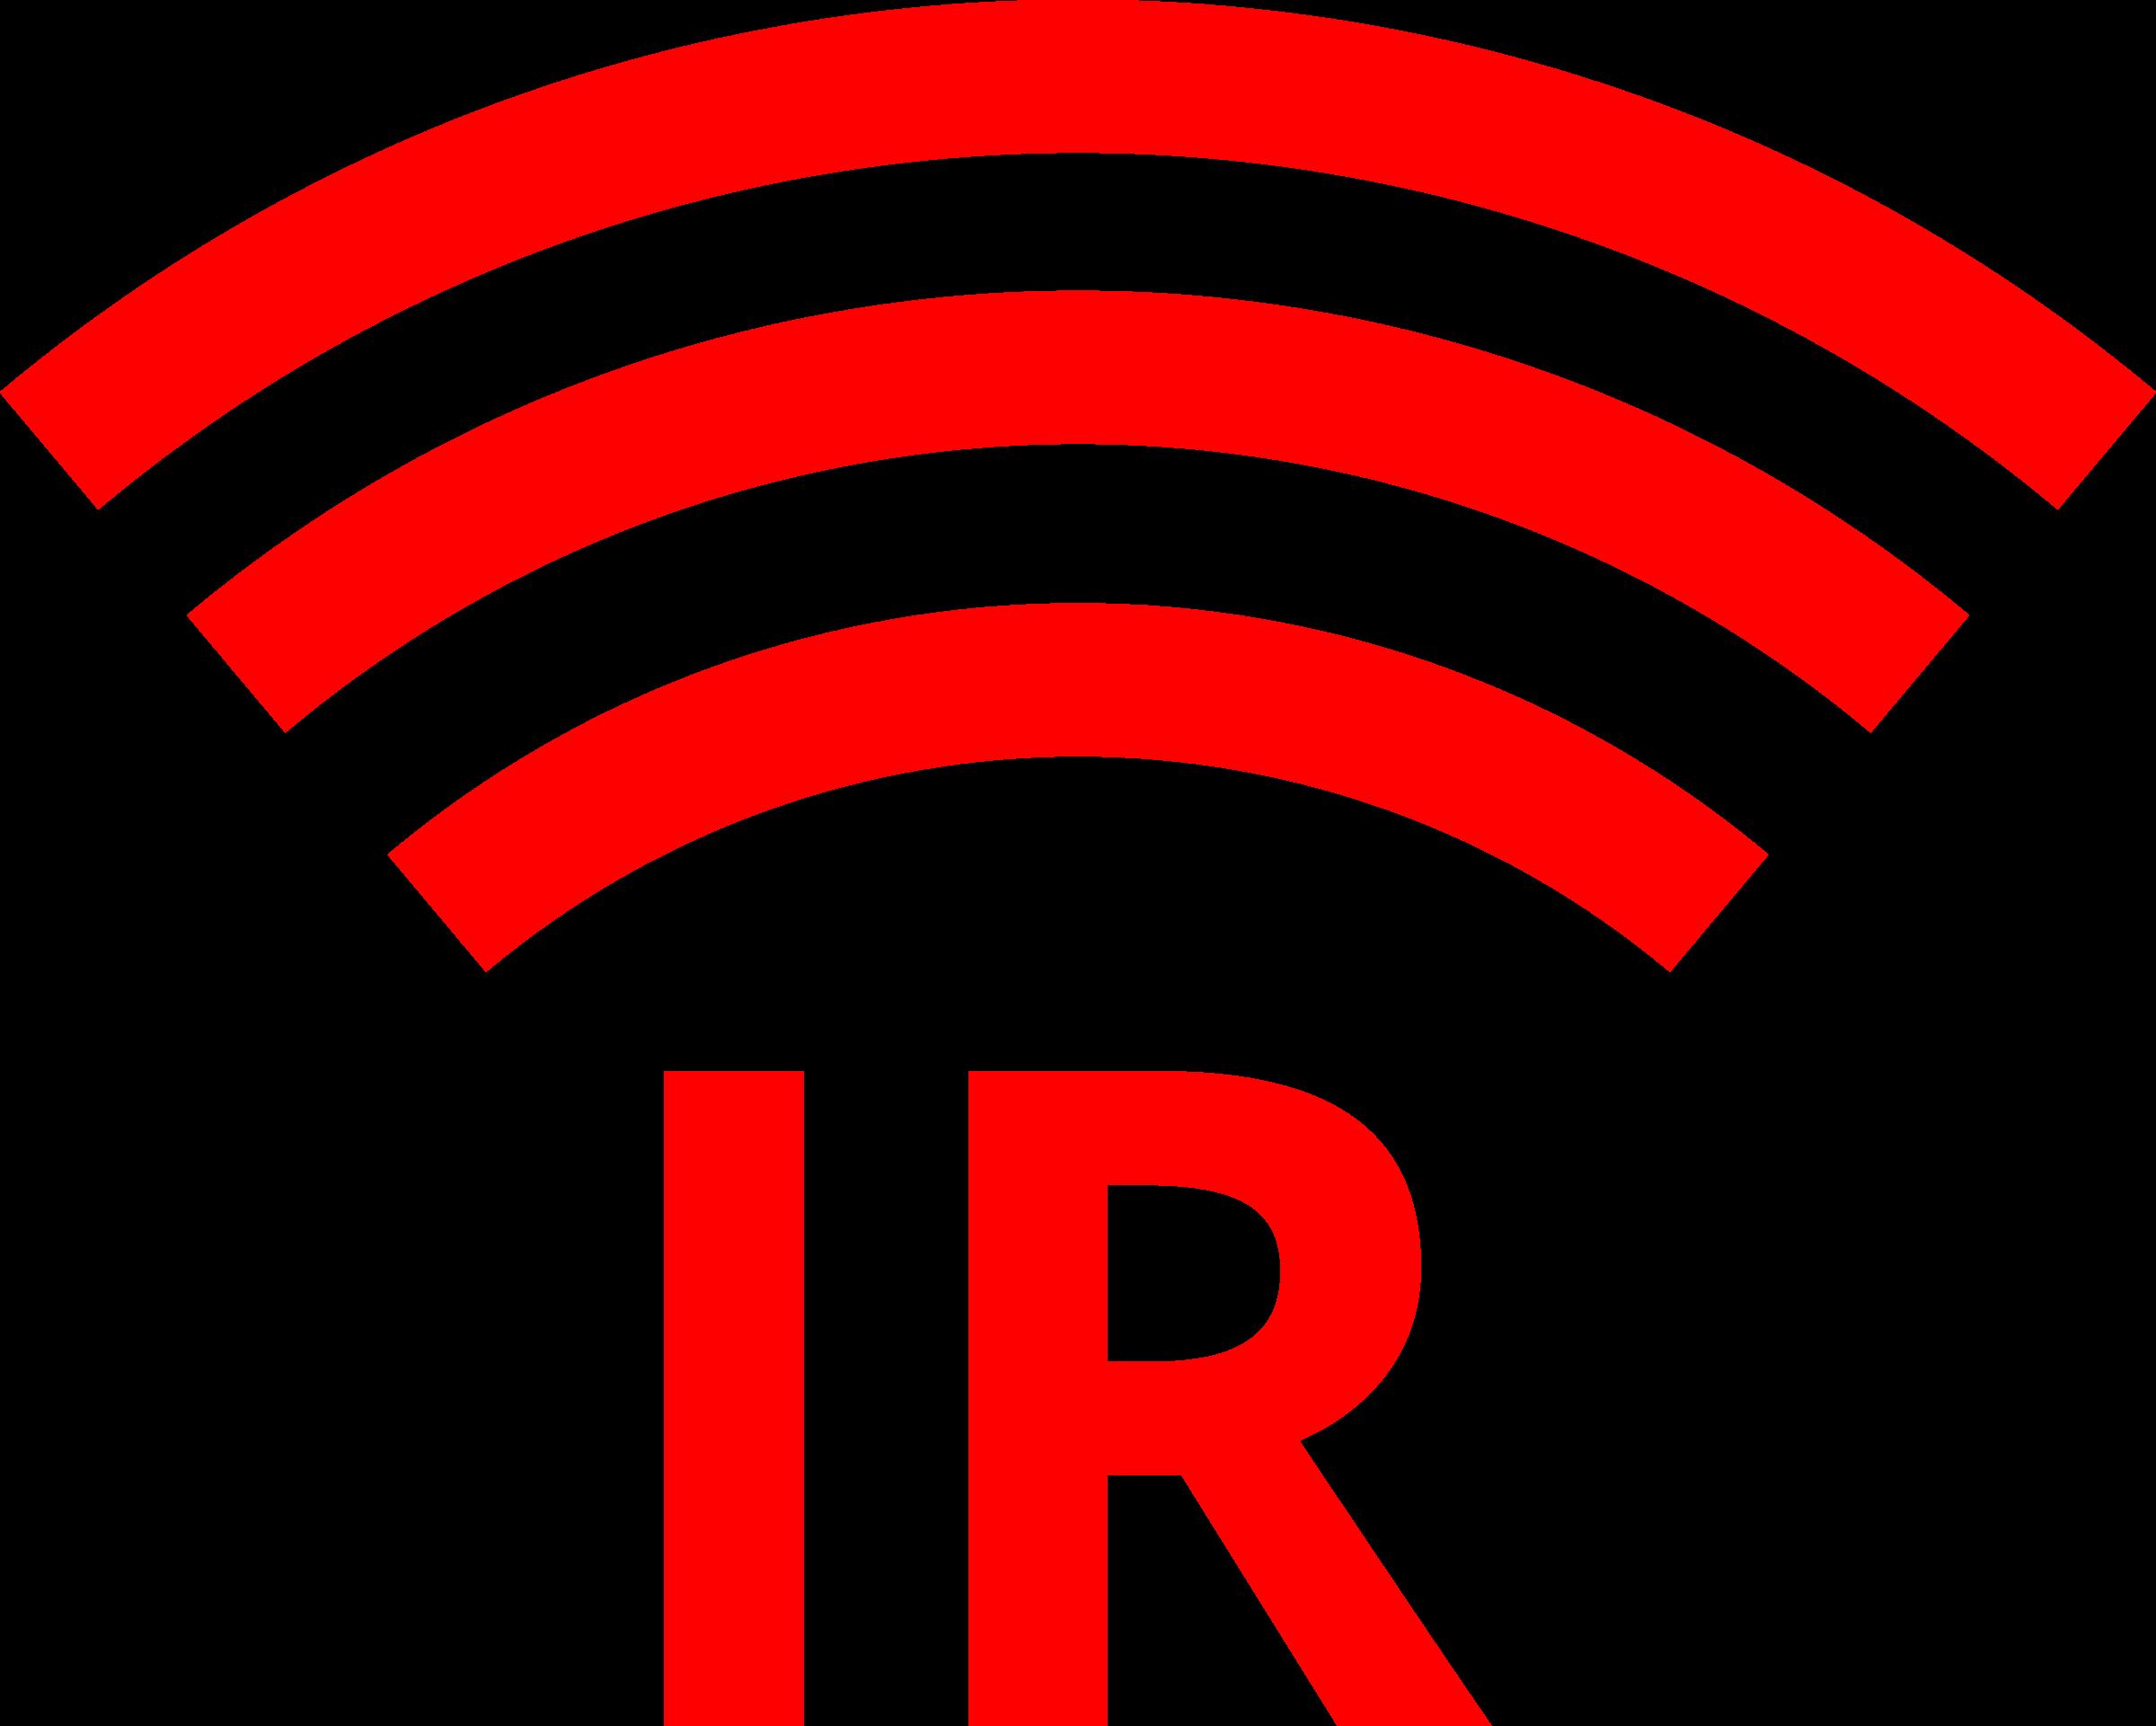 Infrared clipart Symbol logo symbol / logo